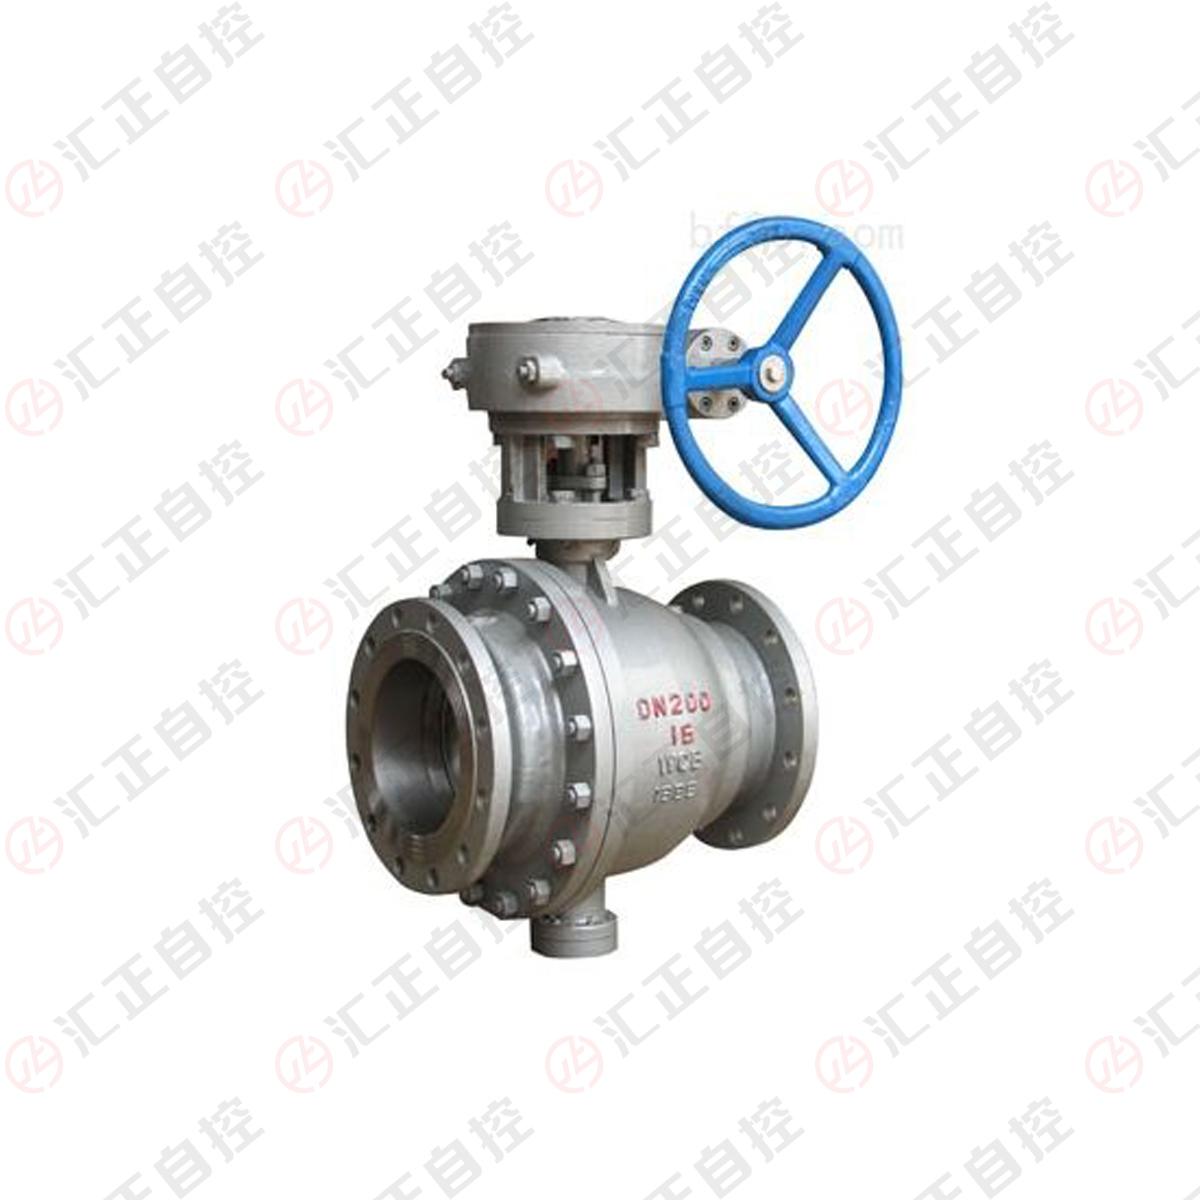 Cast steel trunnion ball valve